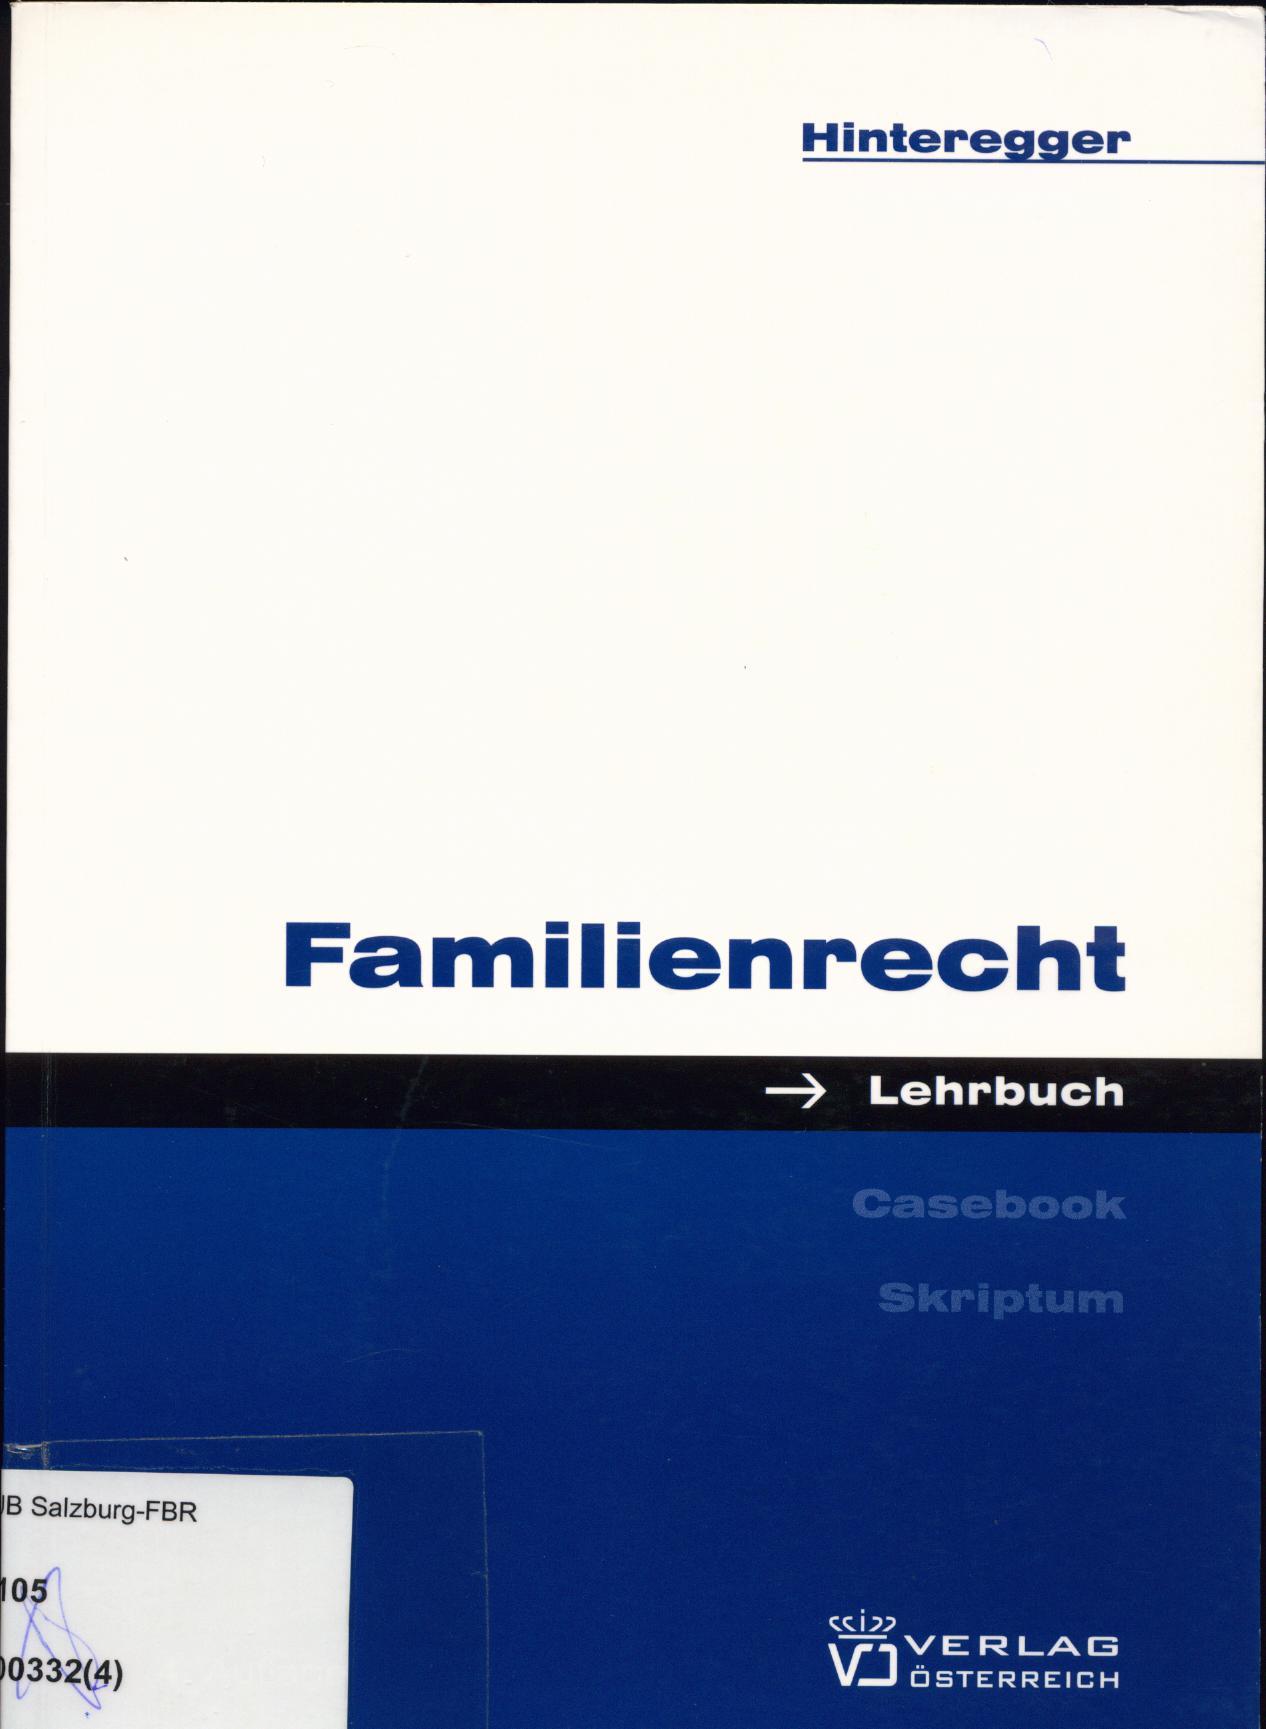 Familienrecht - Hinteregger, Monika